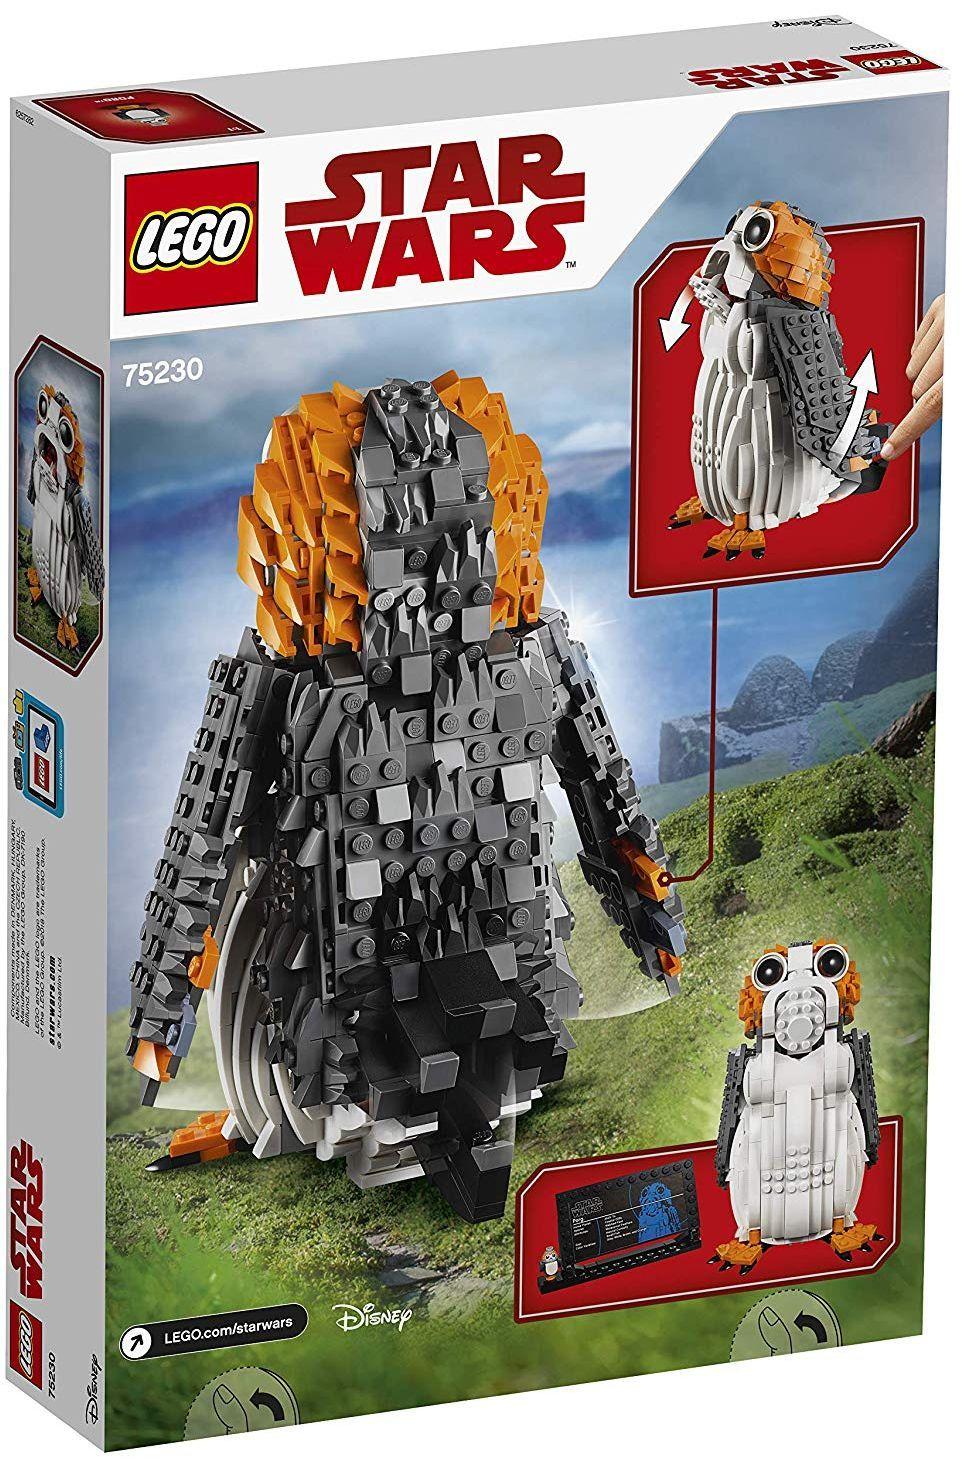 Конструктор Lego Star Wars - Porg (75230) - 6